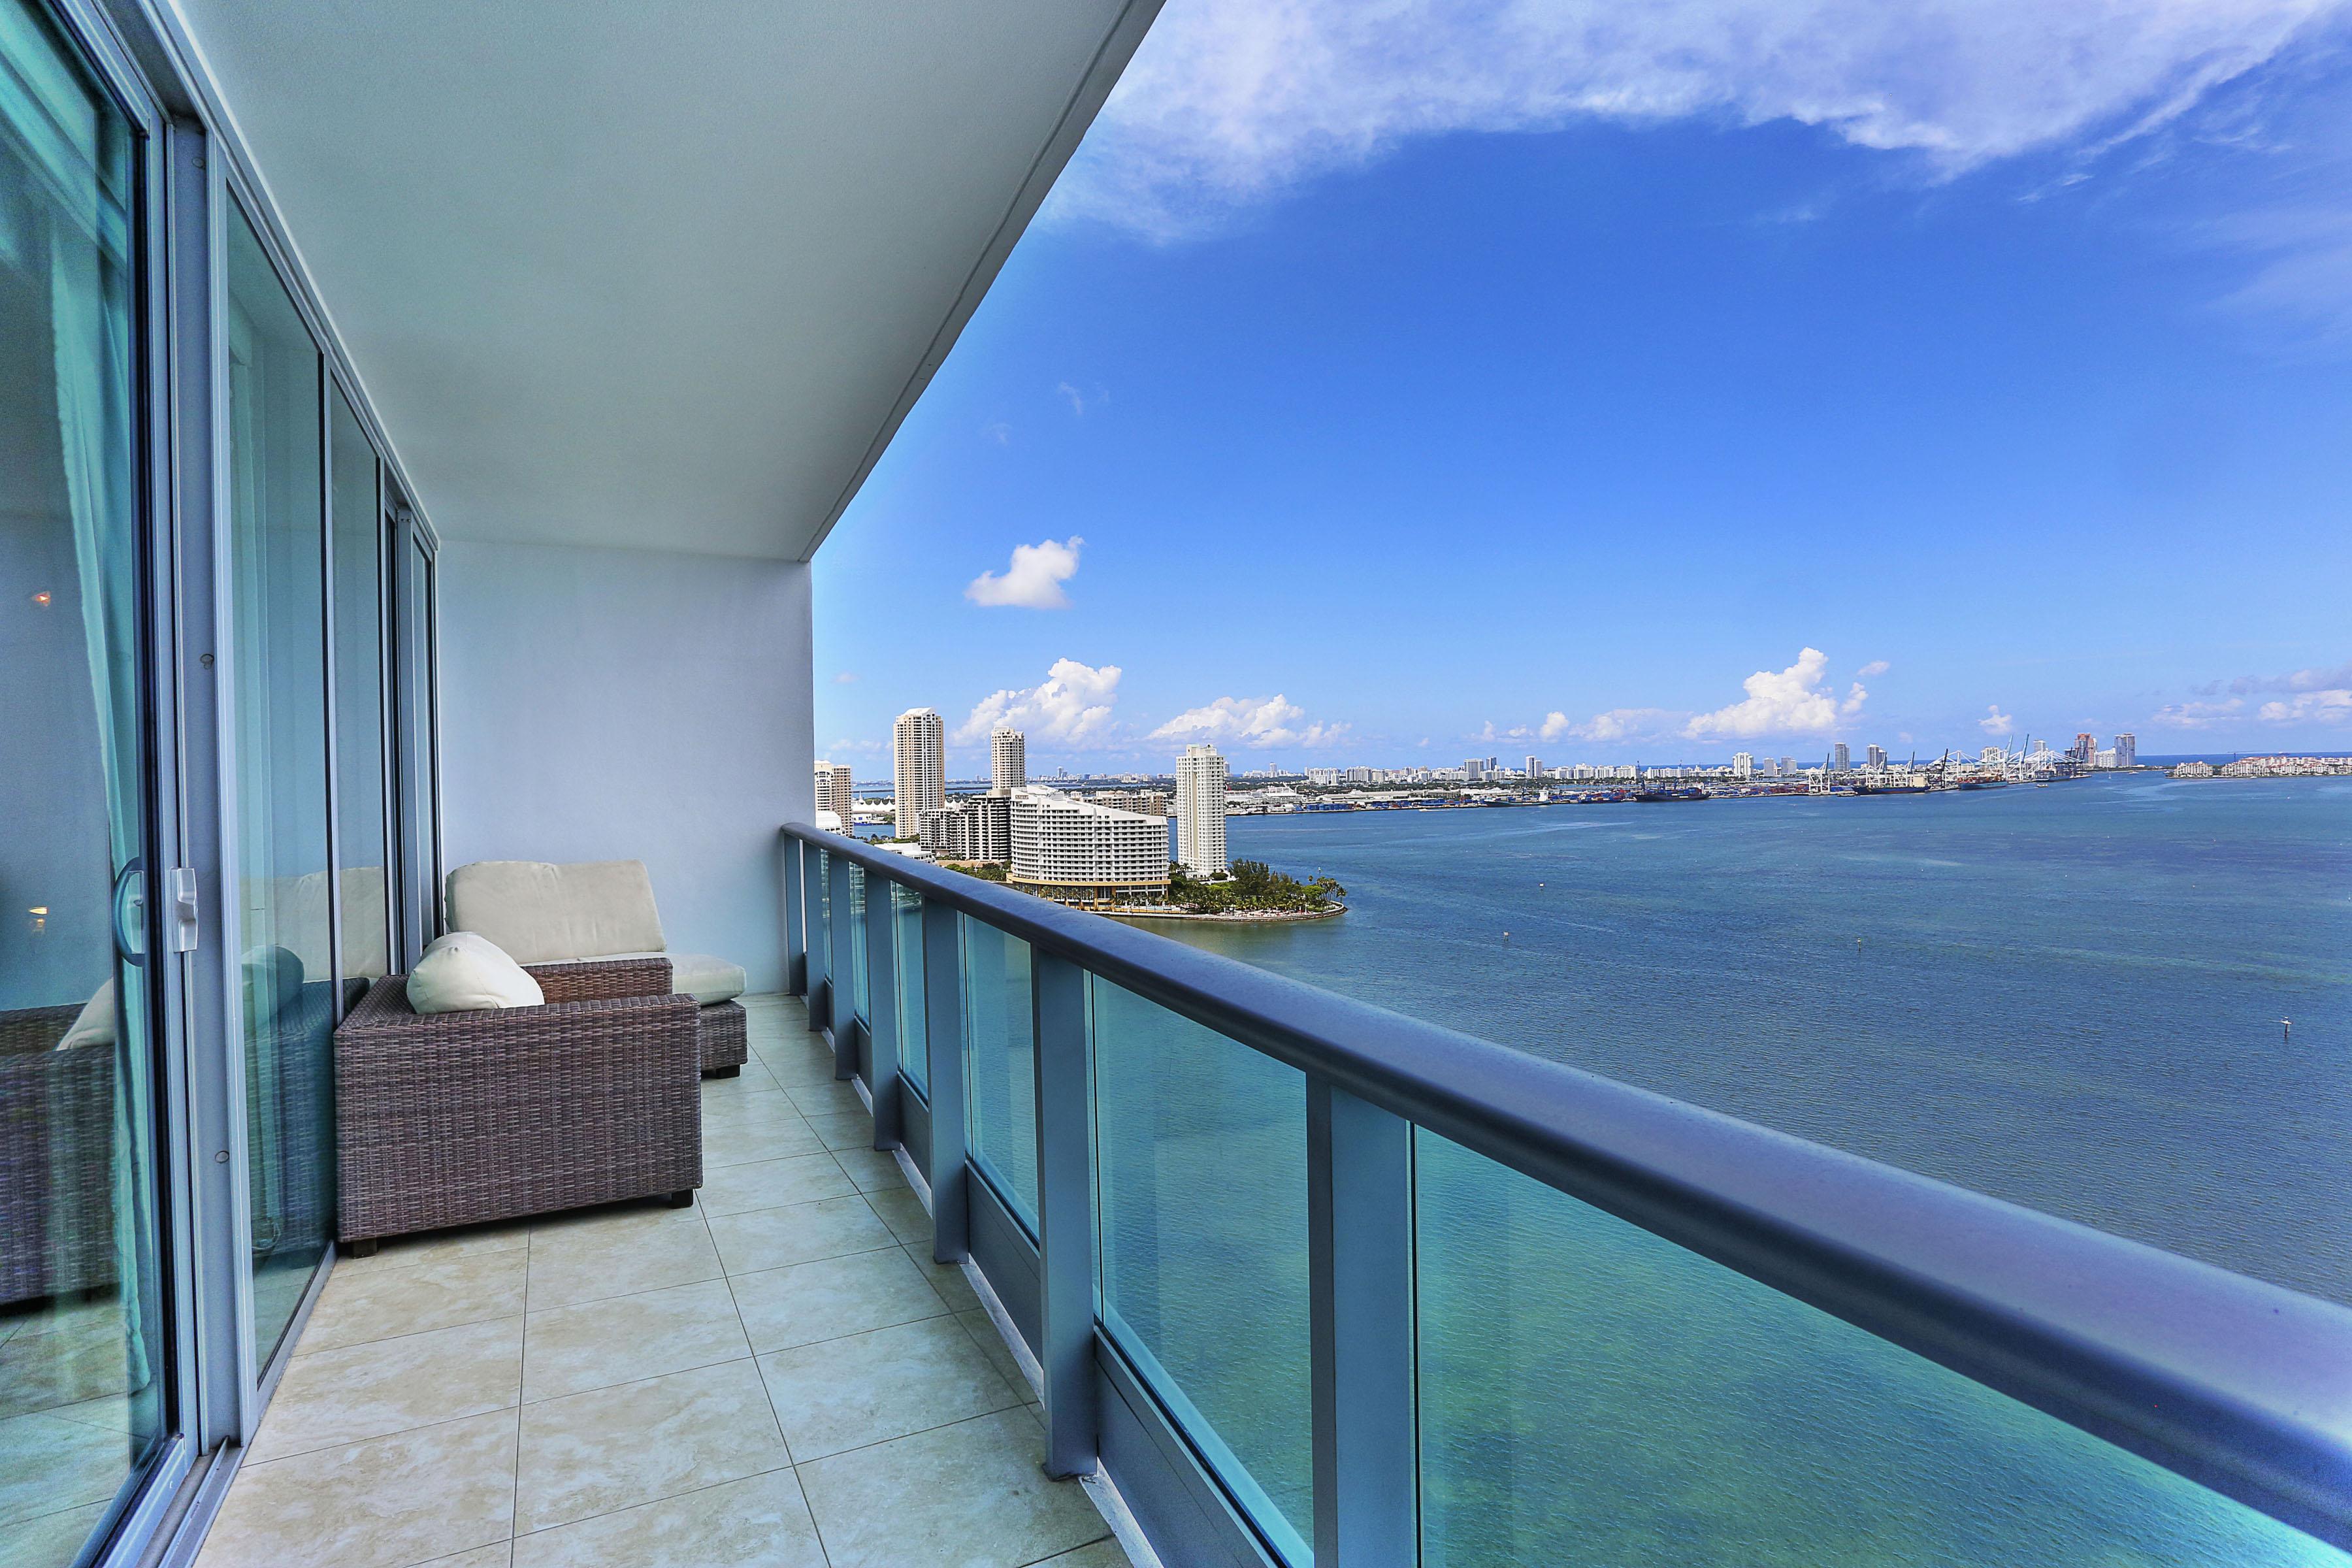 Condominium for Sale at 1331 Brickell Bay Dr #2709 1331 Brickell Bay Dr 2709 Miami, Florida, 33131 United States